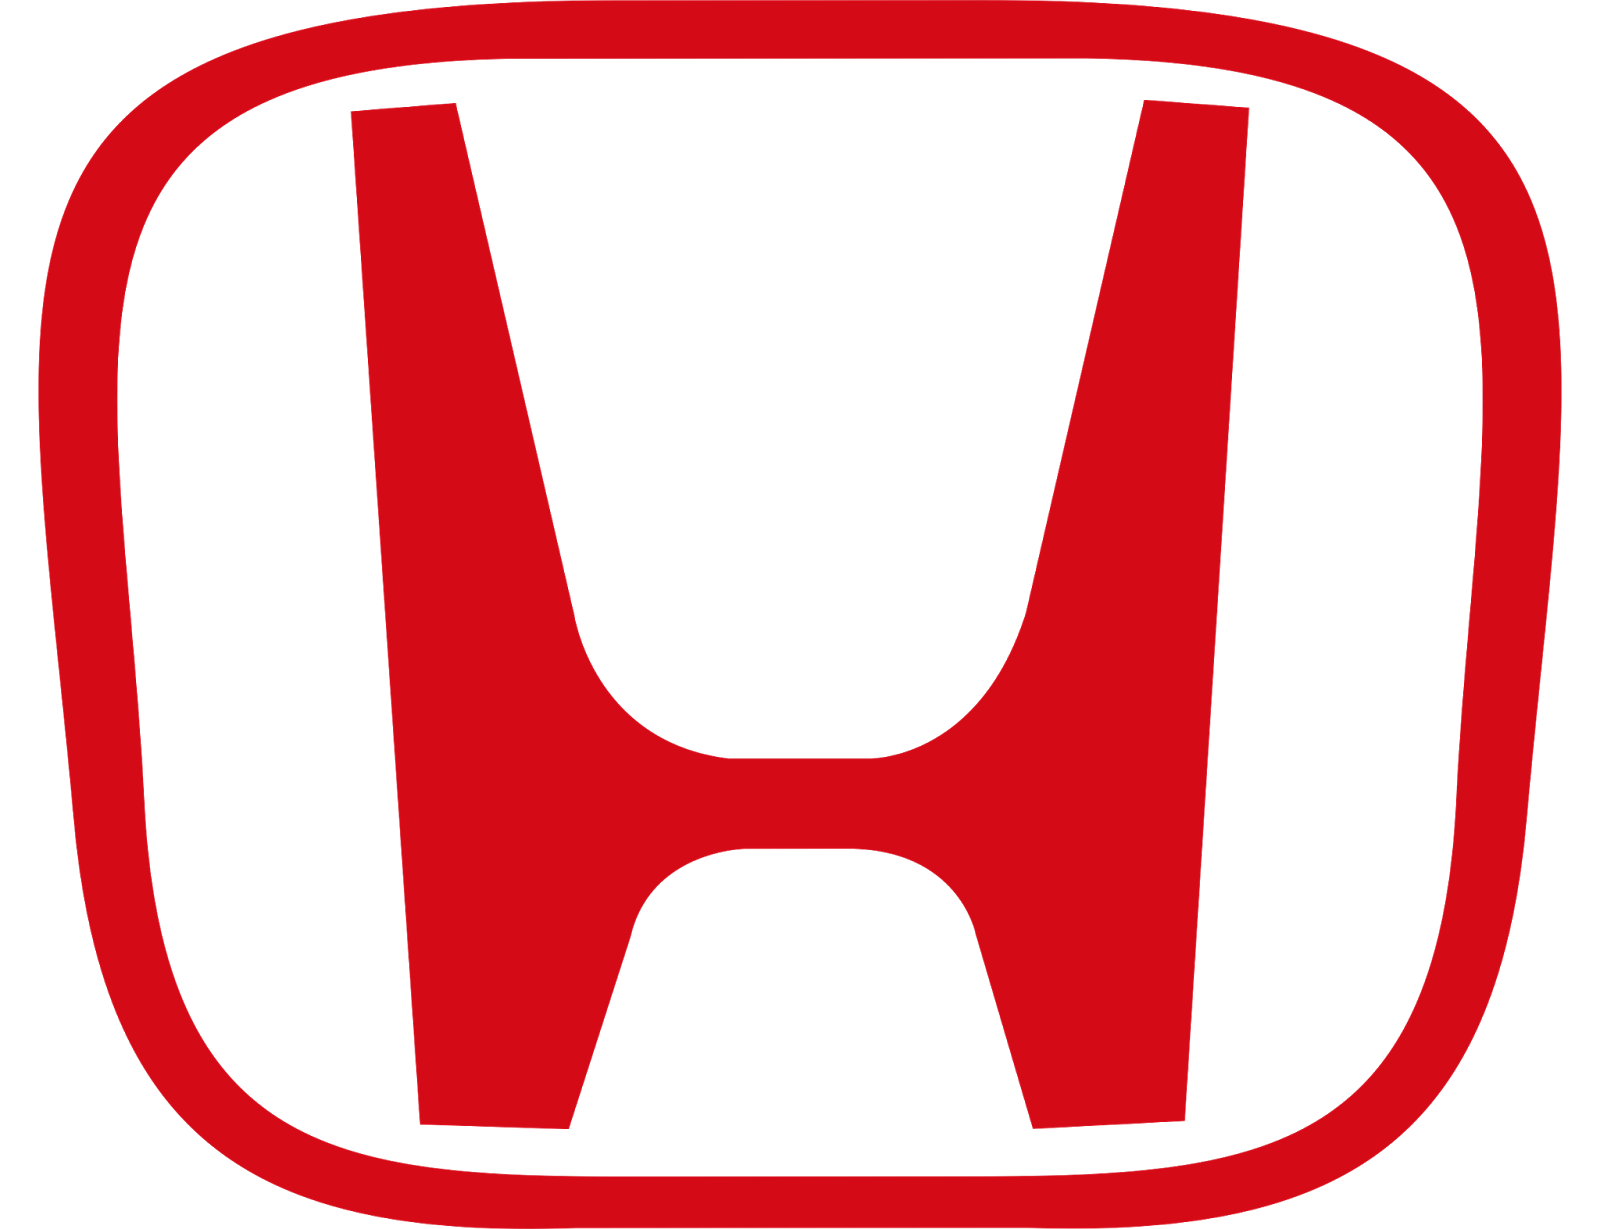 image logo honda png logopedia fandom powered by wikia rh logos wikia com lego honda lego honda